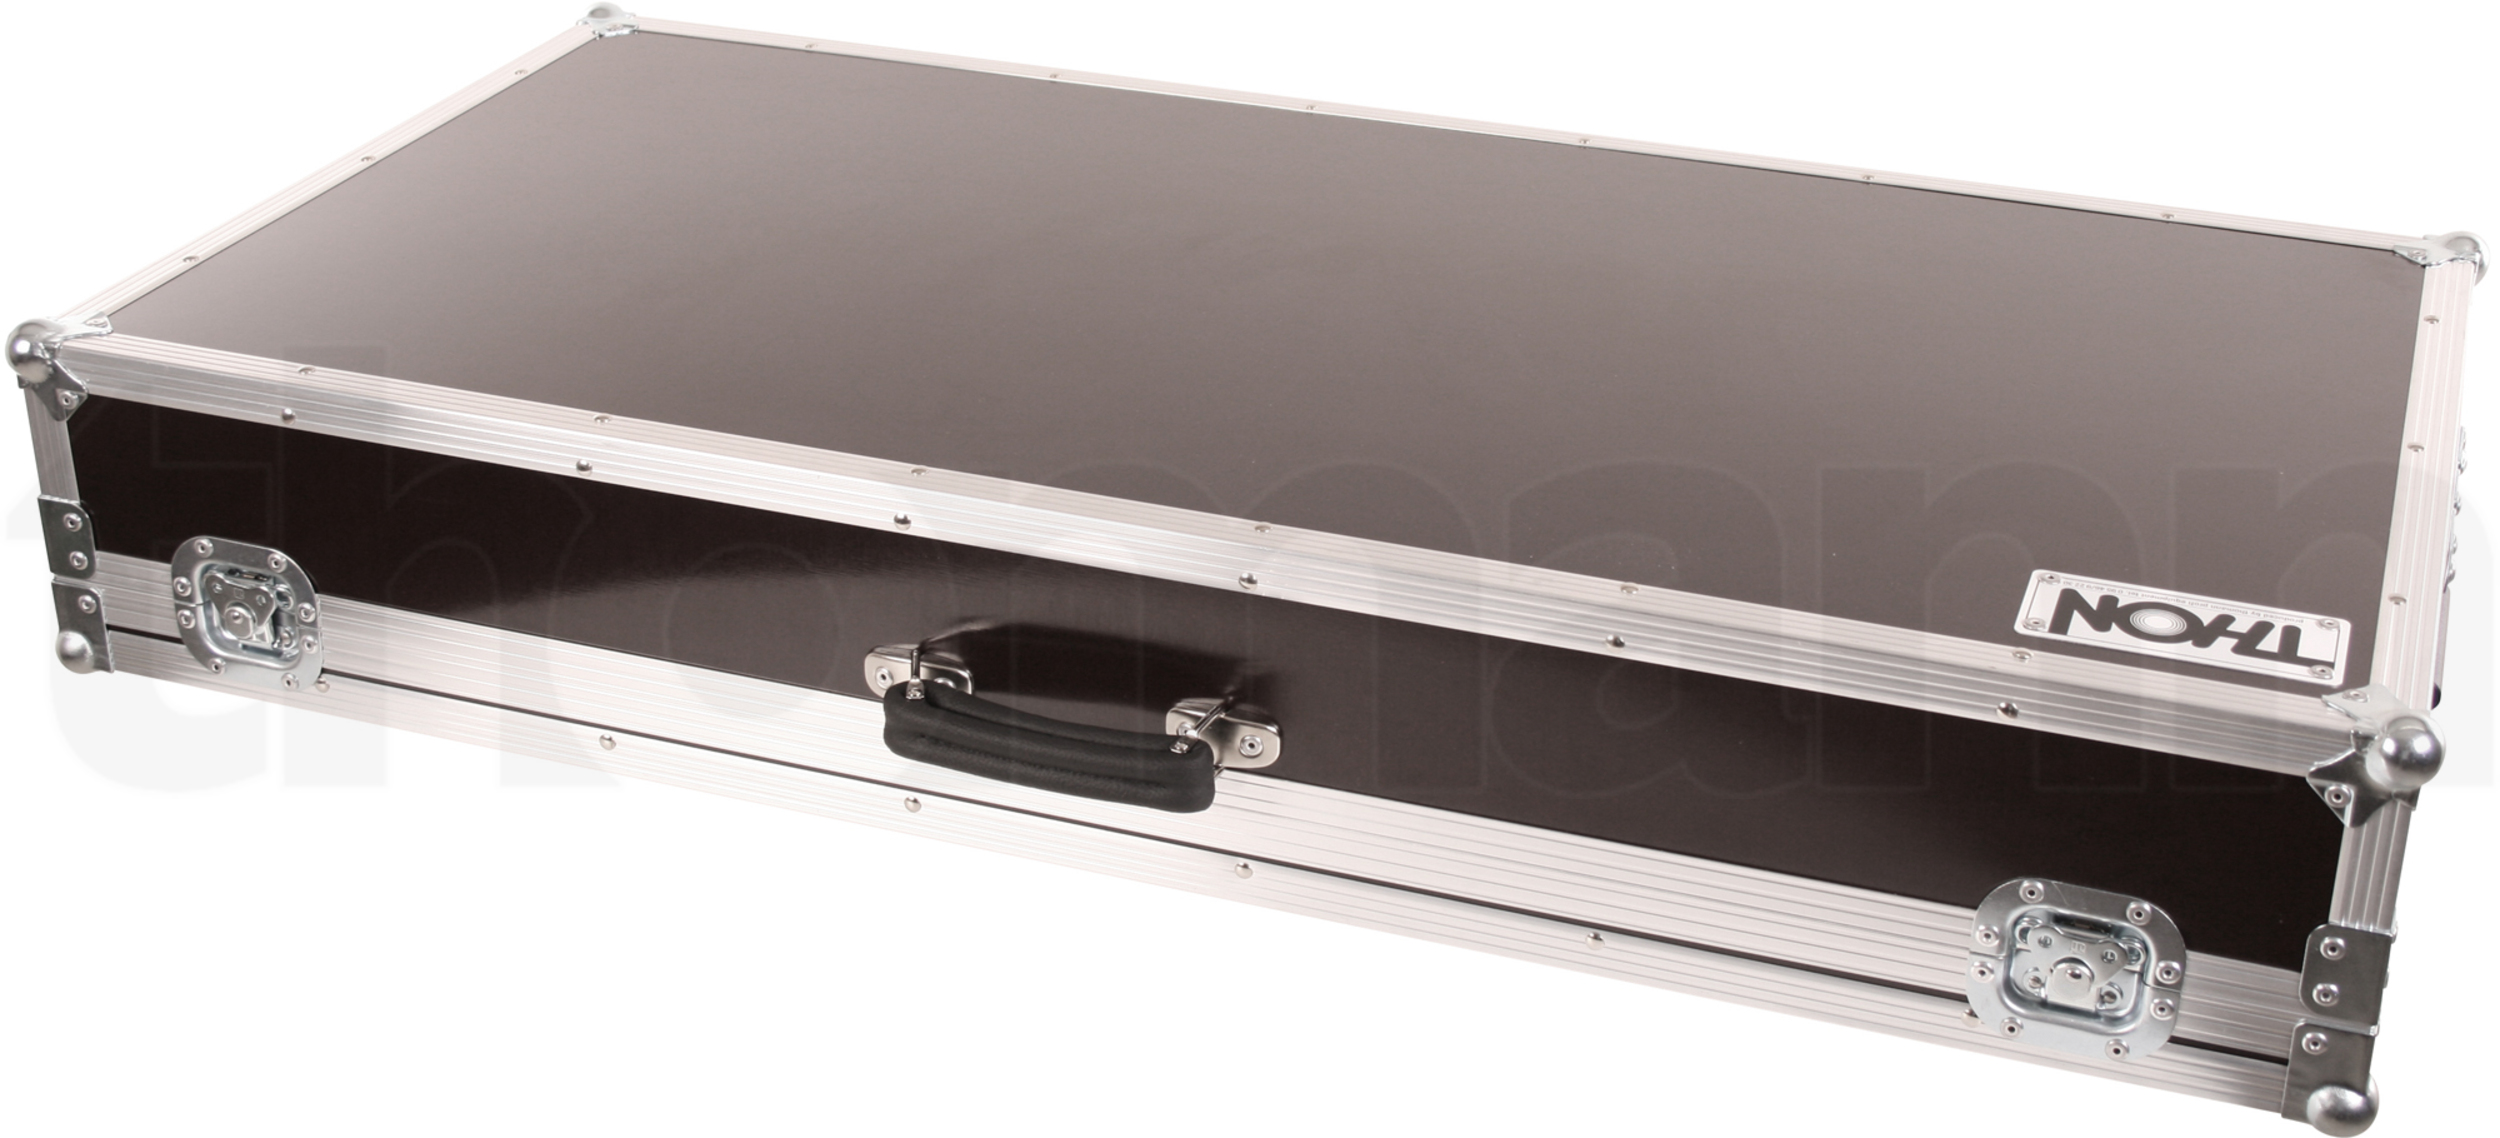 thon flycase pedalboard taille l image 1478980 audiofanzine. Black Bedroom Furniture Sets. Home Design Ideas